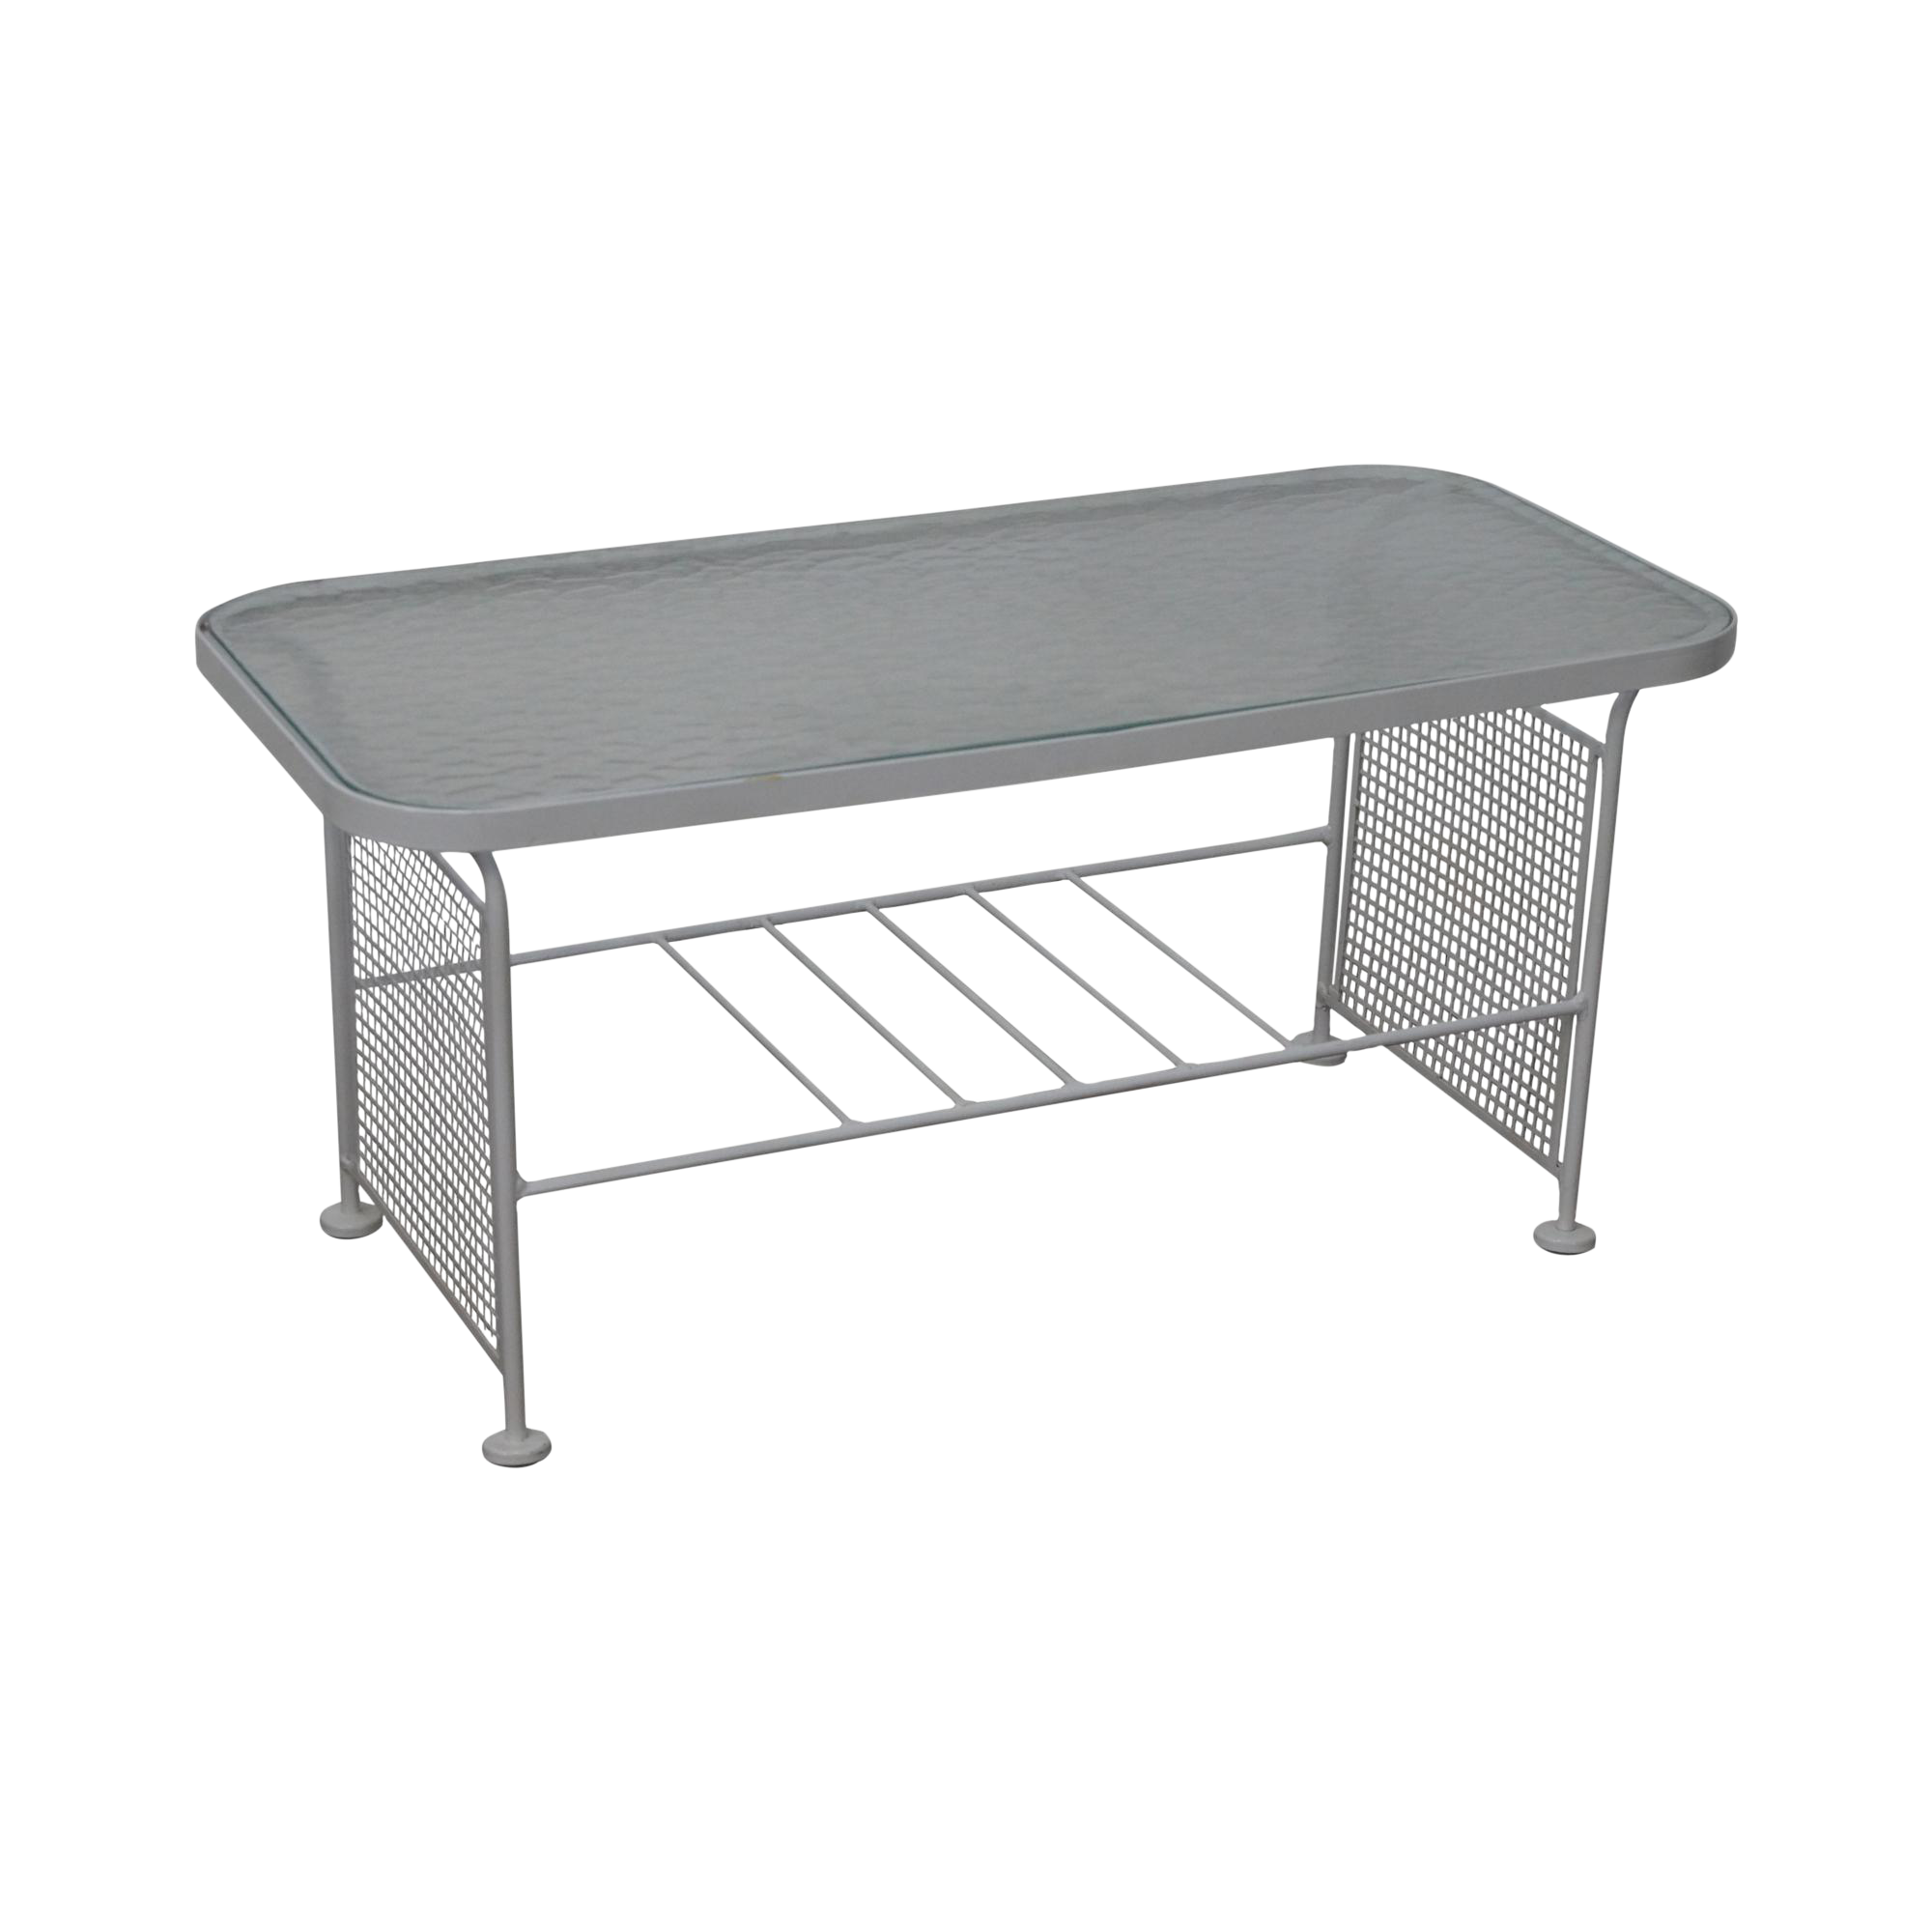 Vintage Woodard White Painted Metal Glass Top Patio Coffee Table Chairish